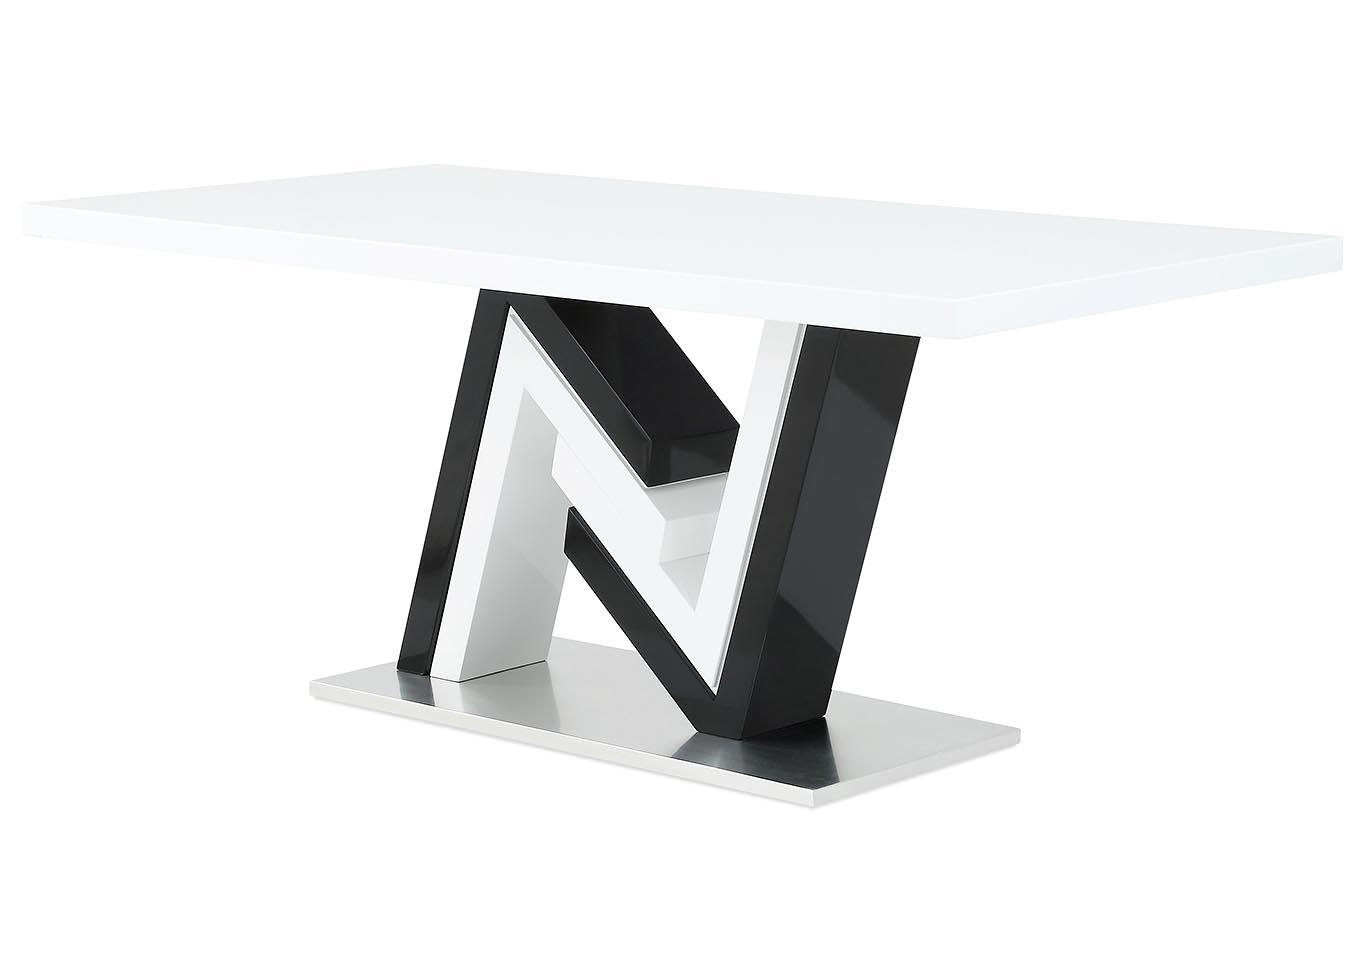 Fine Deals More Furniture Philadelphia Pa White Black Download Free Architecture Designs Crovemadebymaigaardcom